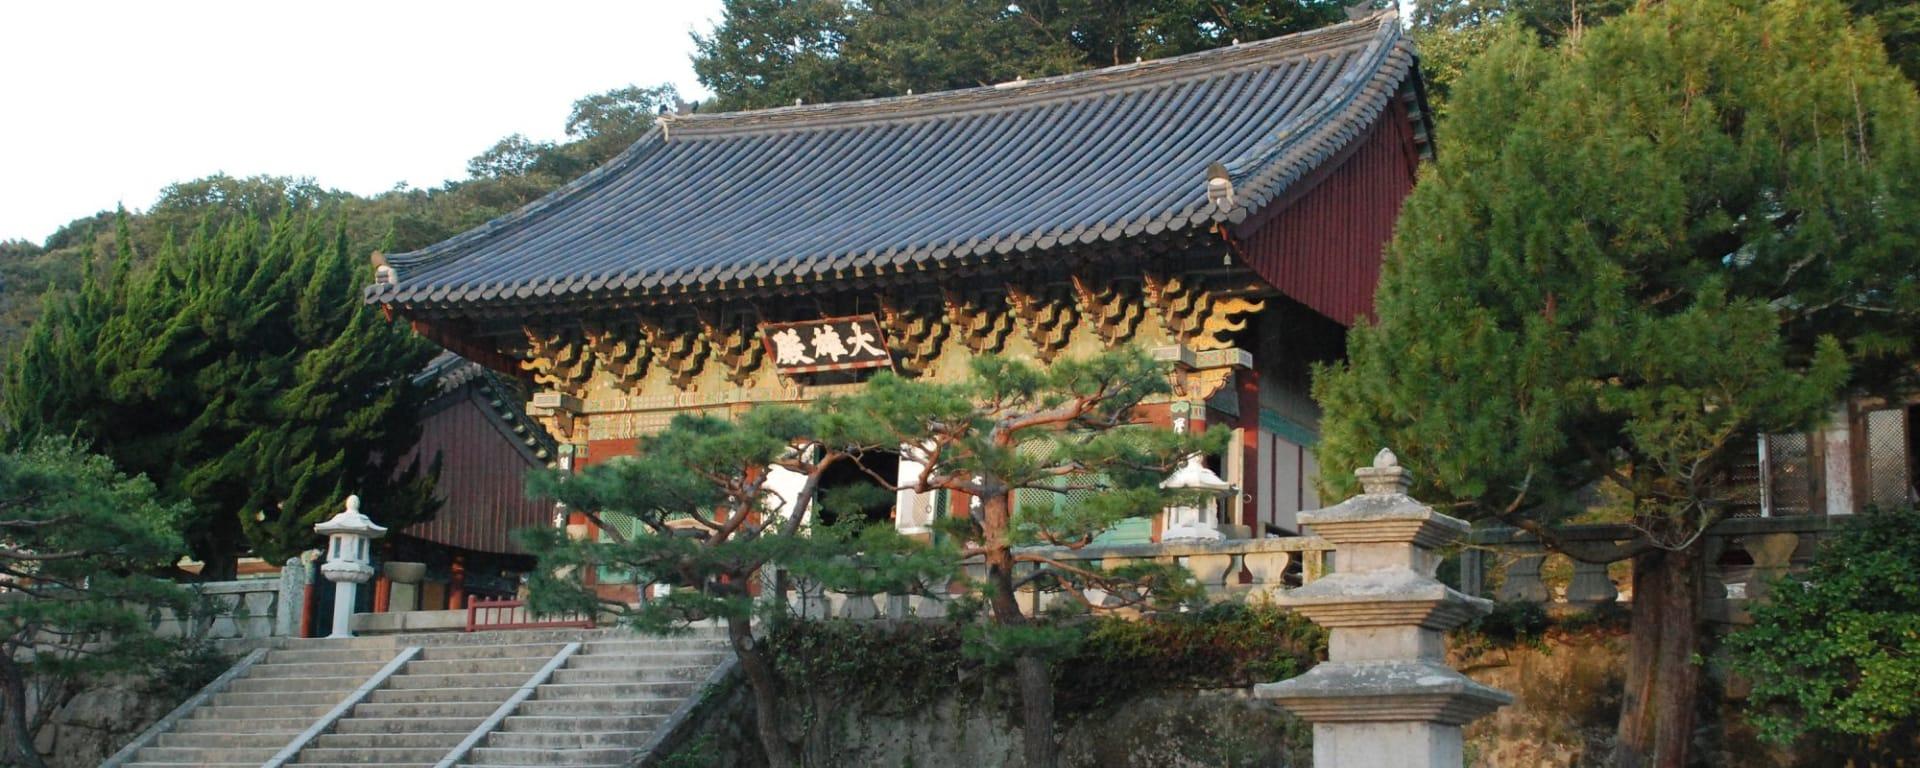 Temple Stay ab Busan: Beomeosa Temple 04 (Busan)